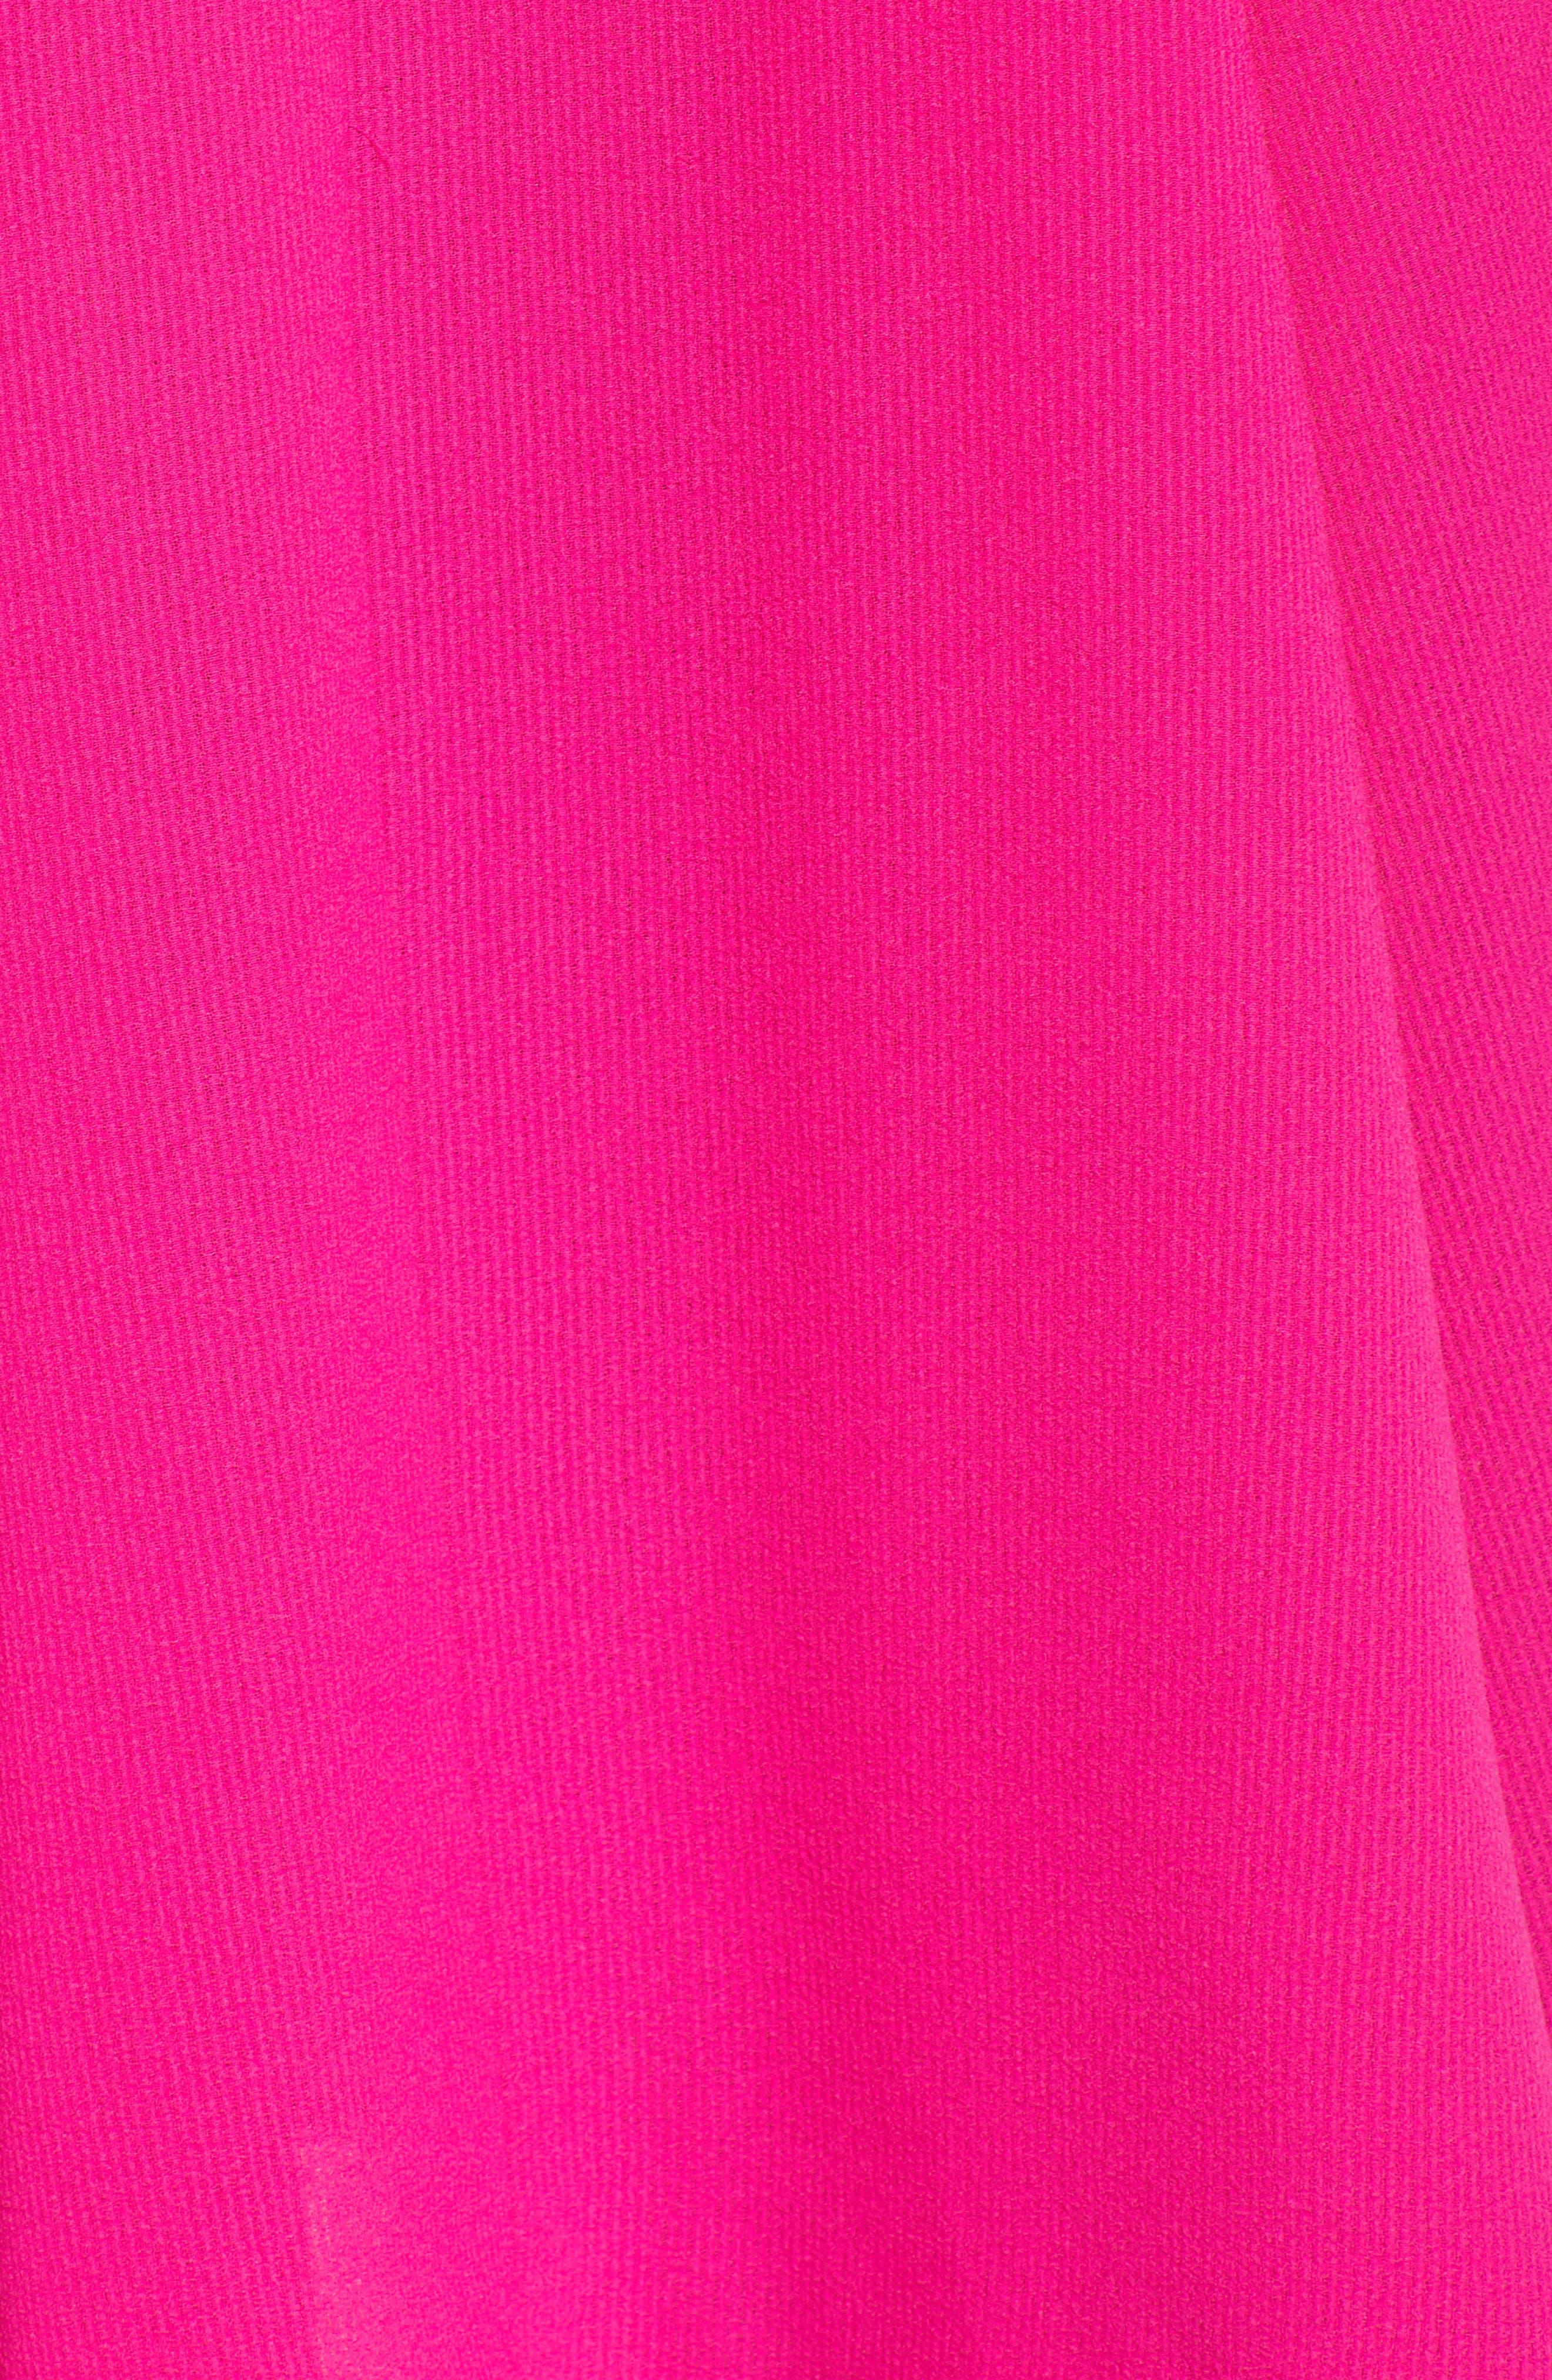 Chiffon Midi Dress,                             Alternate thumbnail 7, color,                             Fuchsia